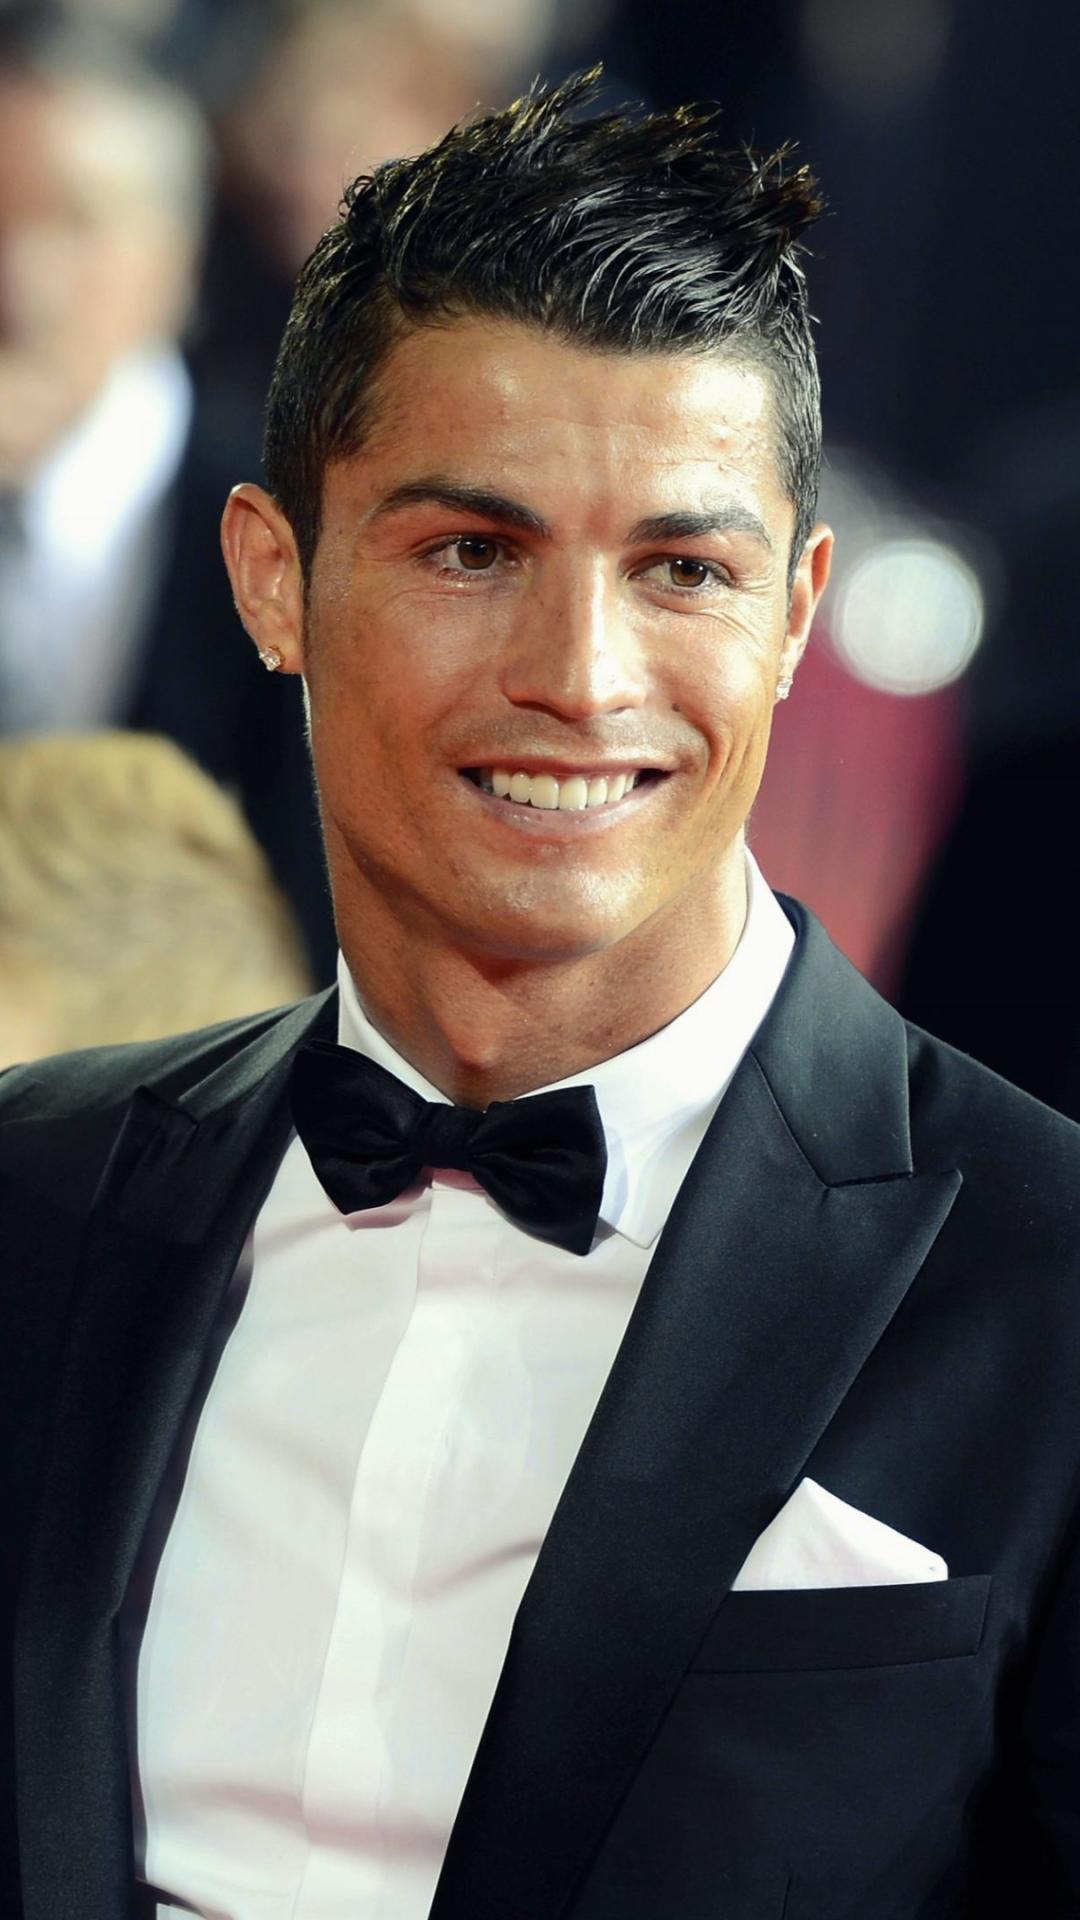 iPhone 6 Plus SportsCristiano Ronaldo Wallpaper ID 637770